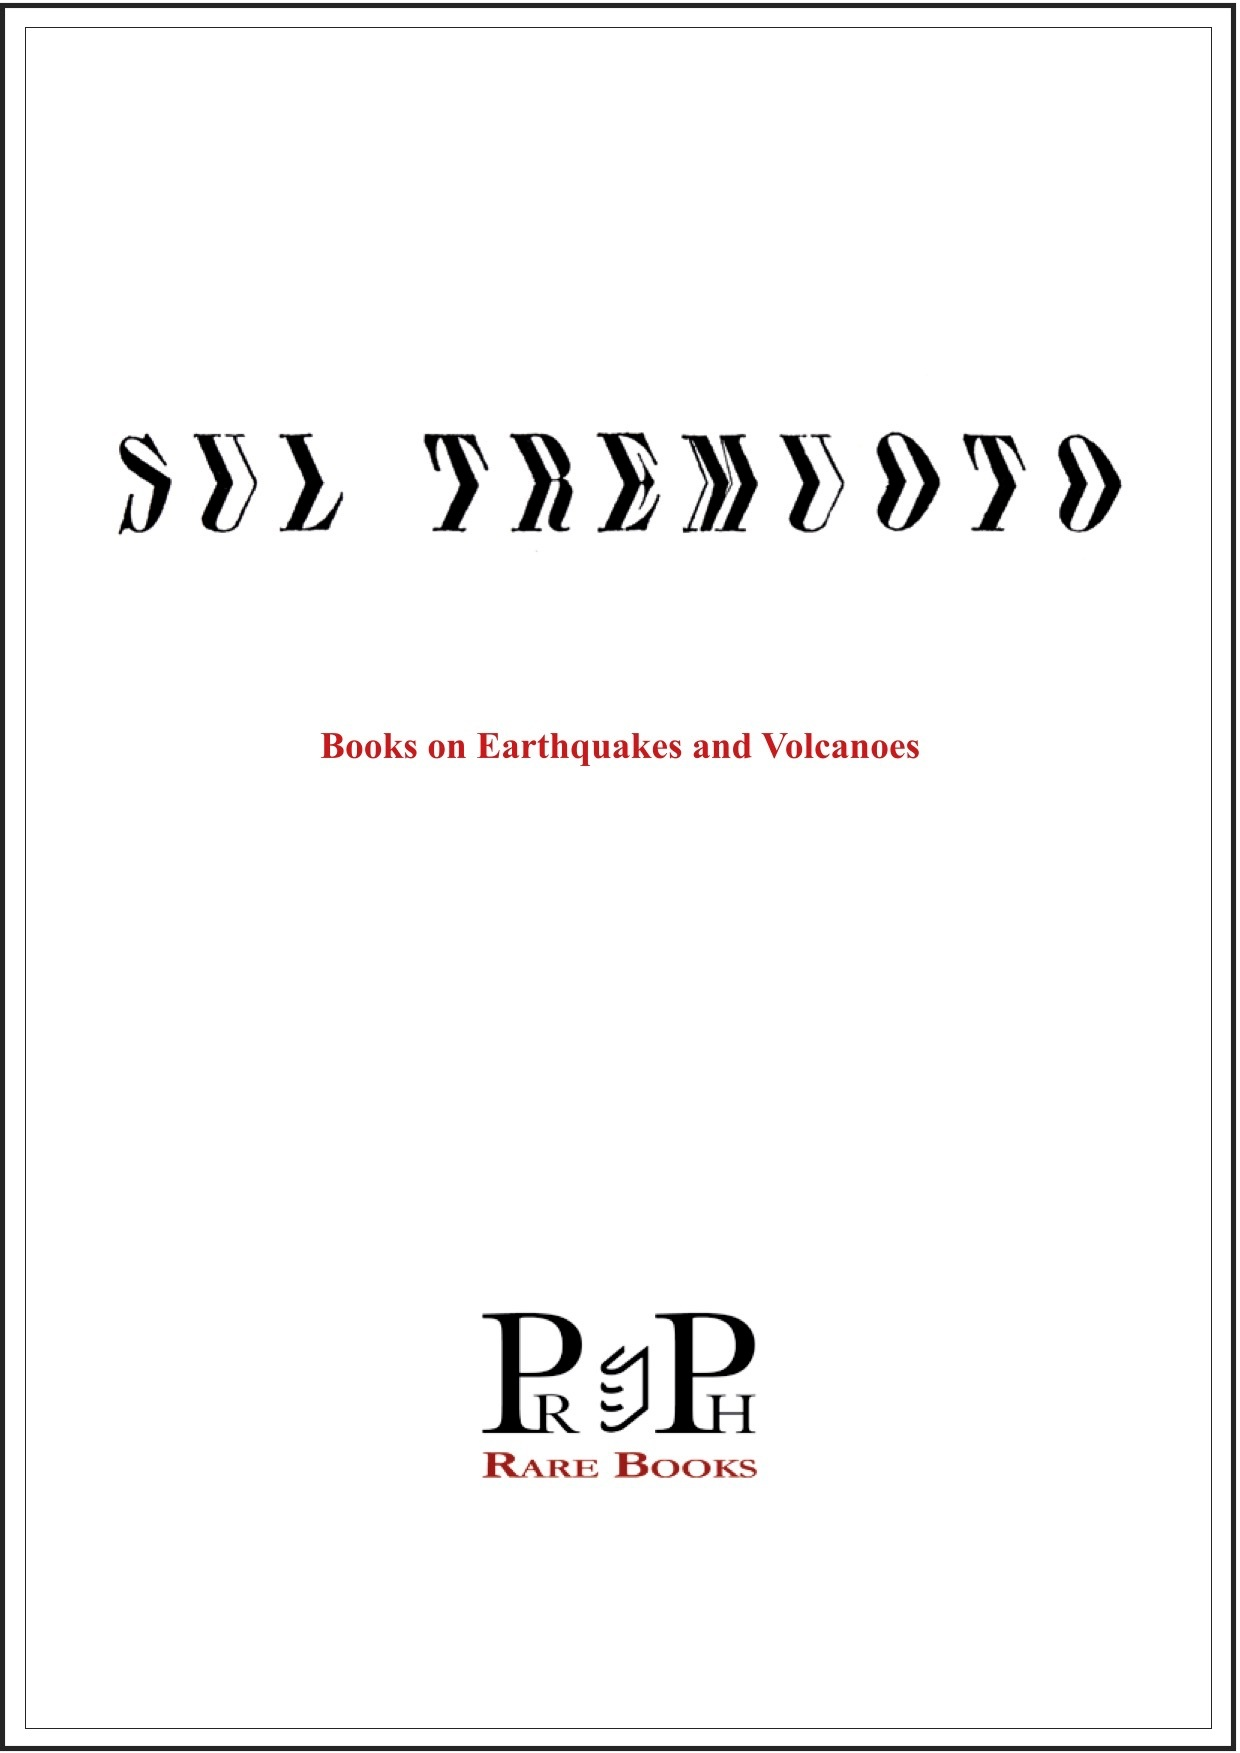 Earthquakes+cataogue+with+border.jpg